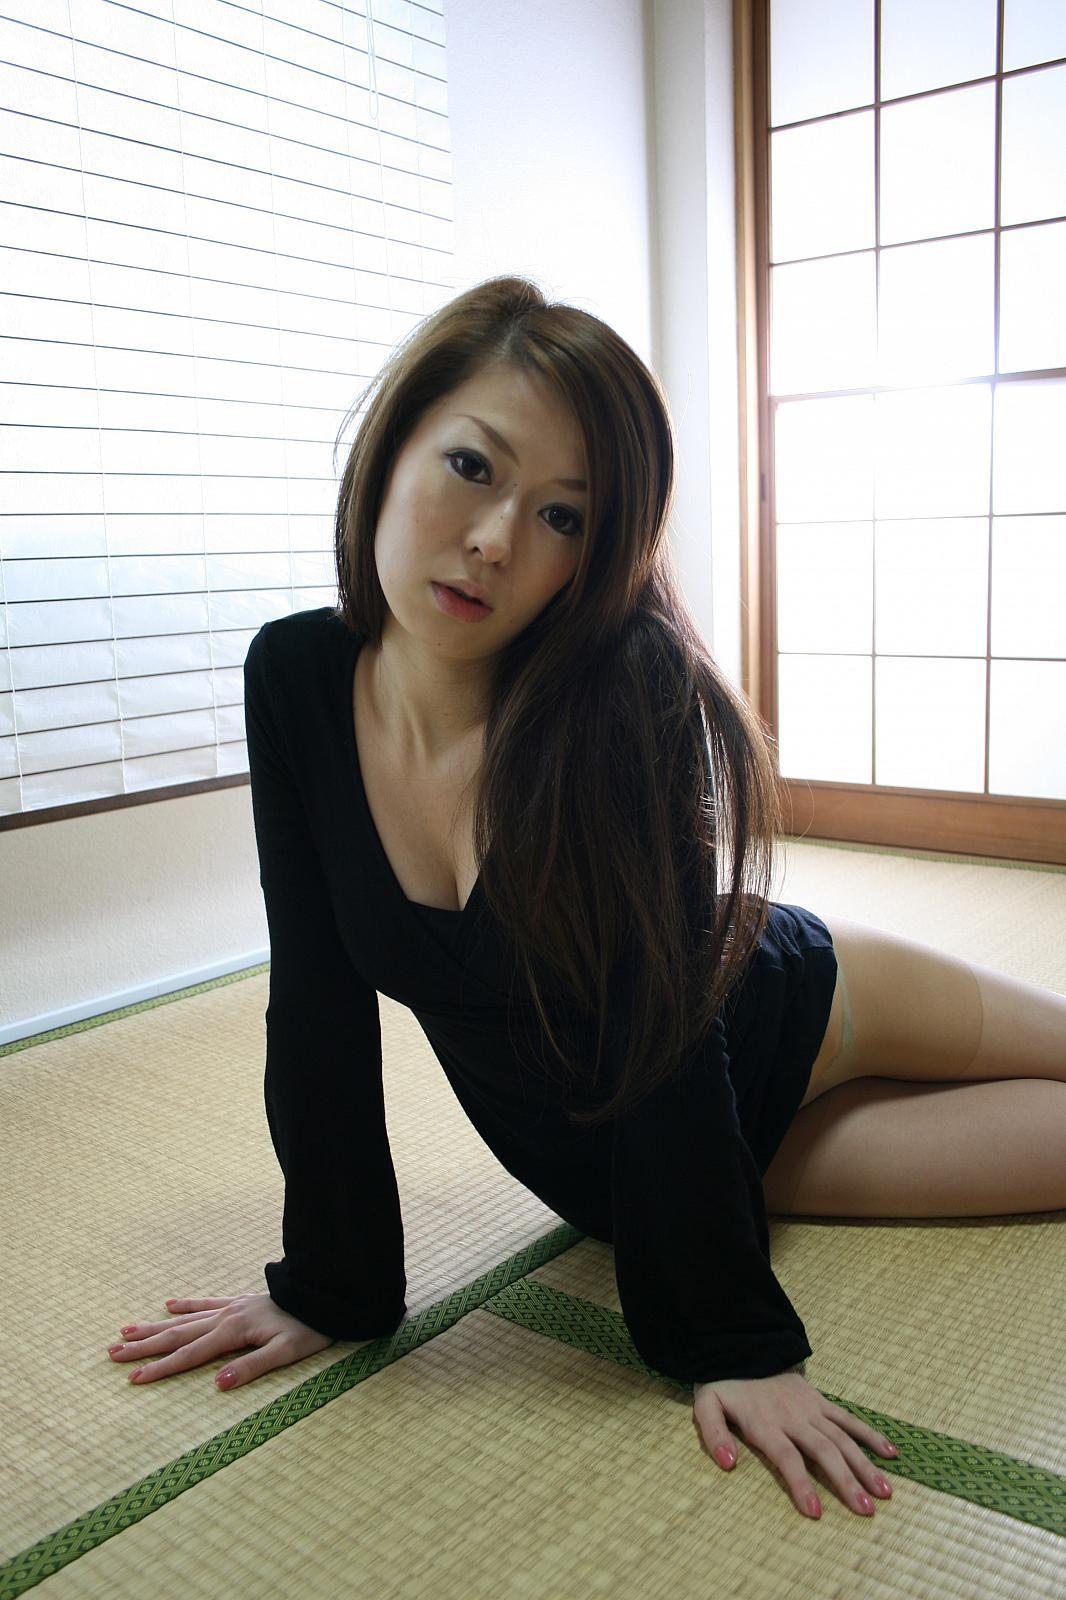 Nude asses granny